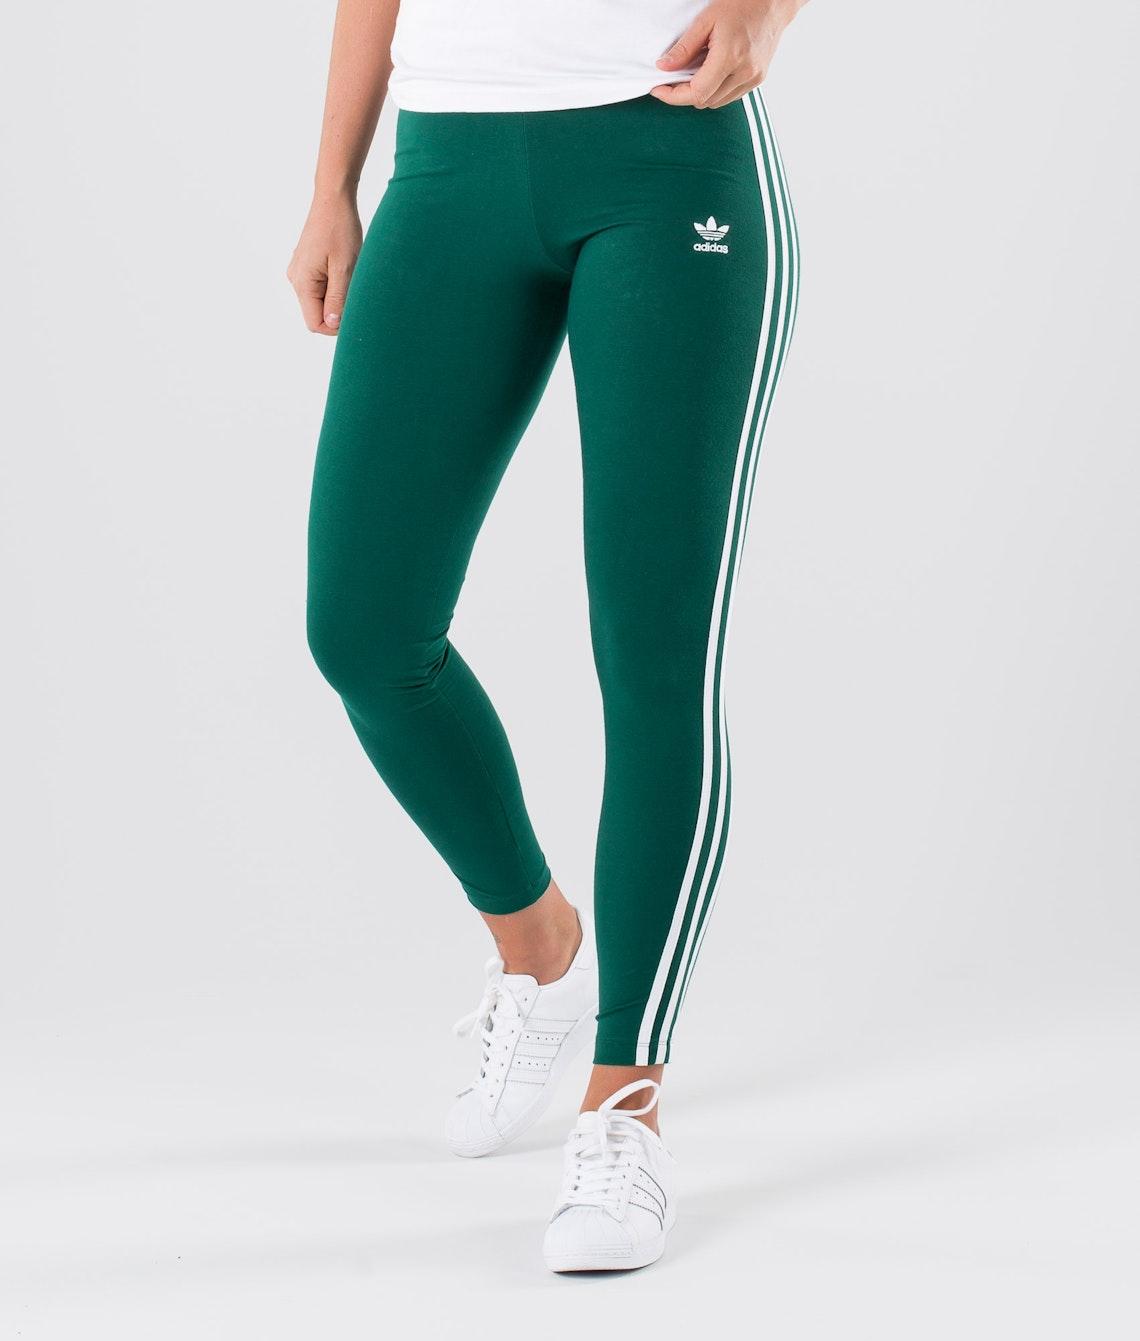 Legging Adidas 3 Stripes 1